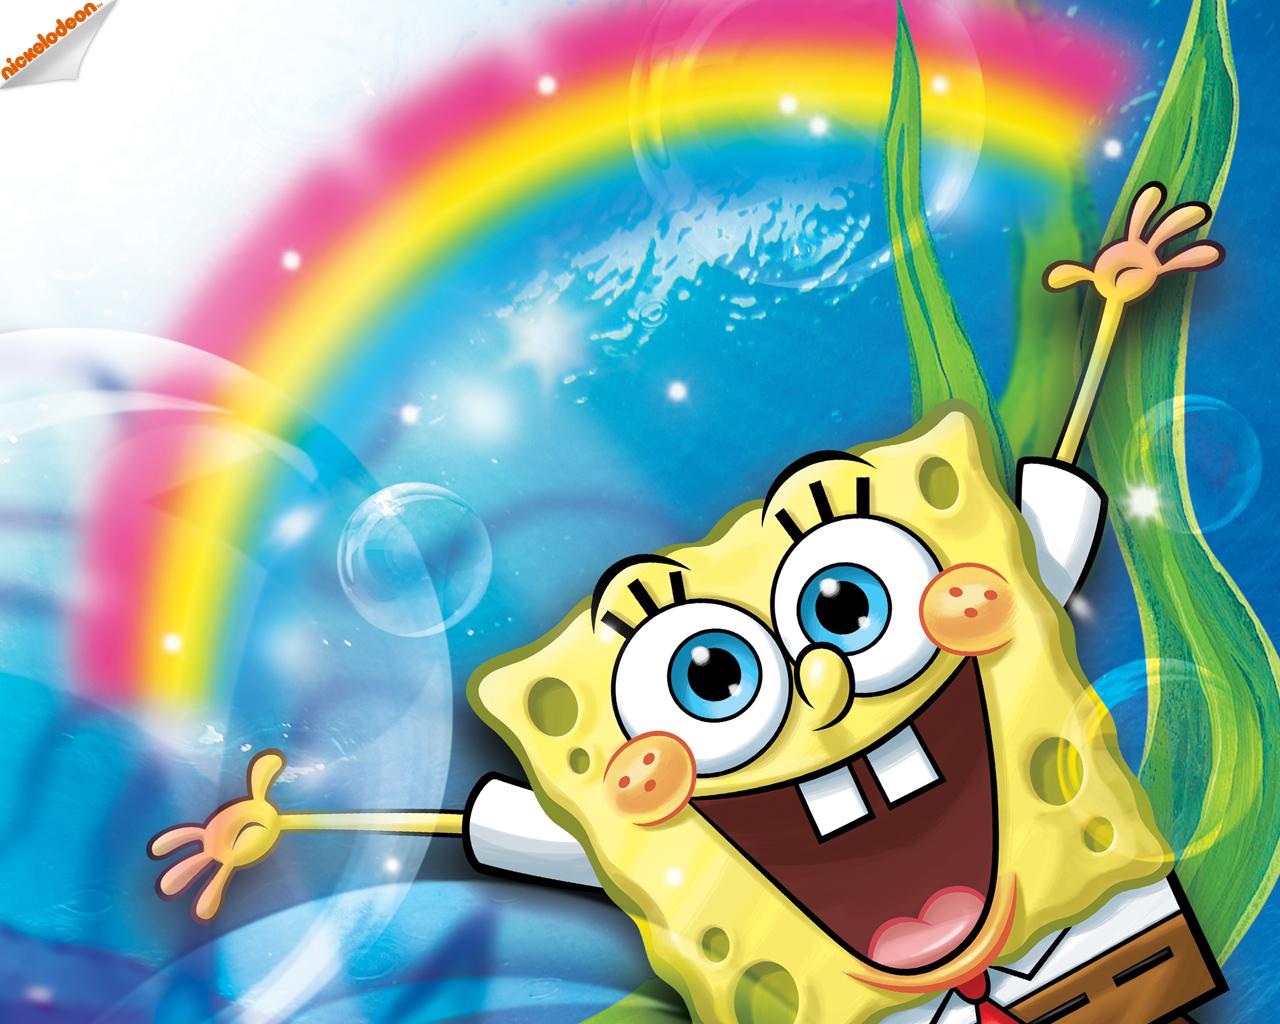 Spongebob Squarepants Baby Characters 48934 Usbdata